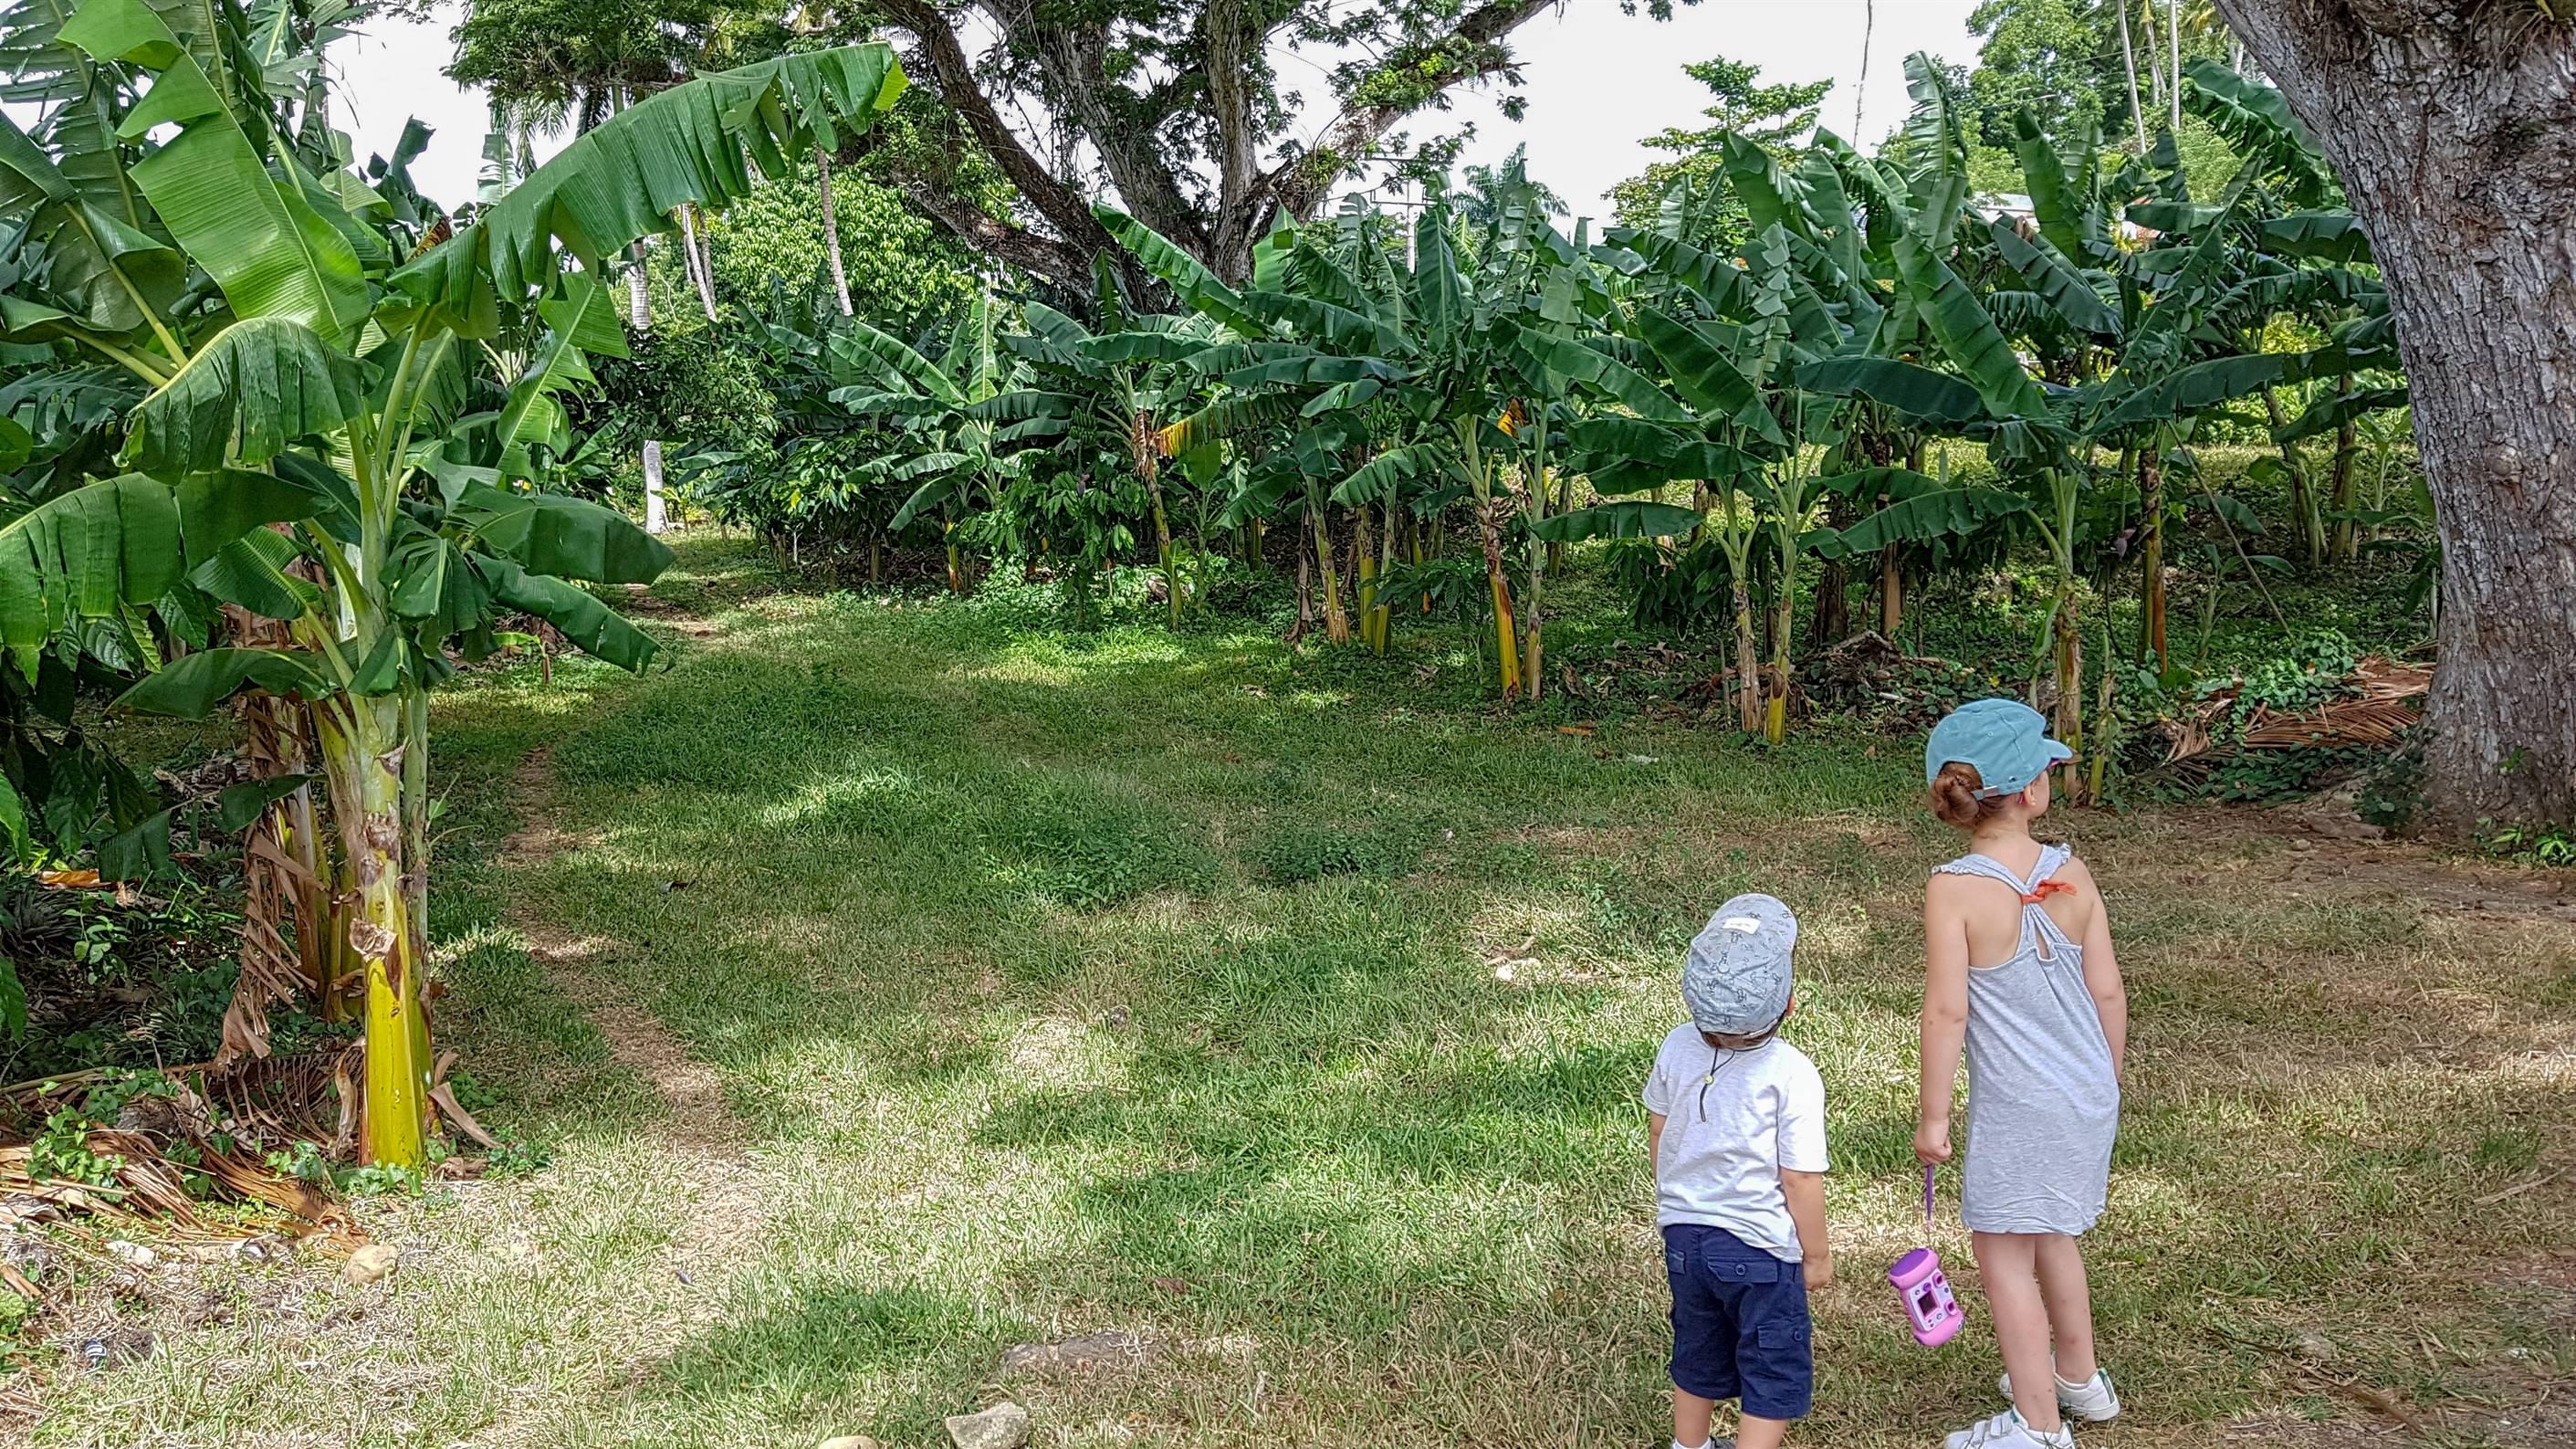 Plantation de Cacao, Baracoa, Cuba